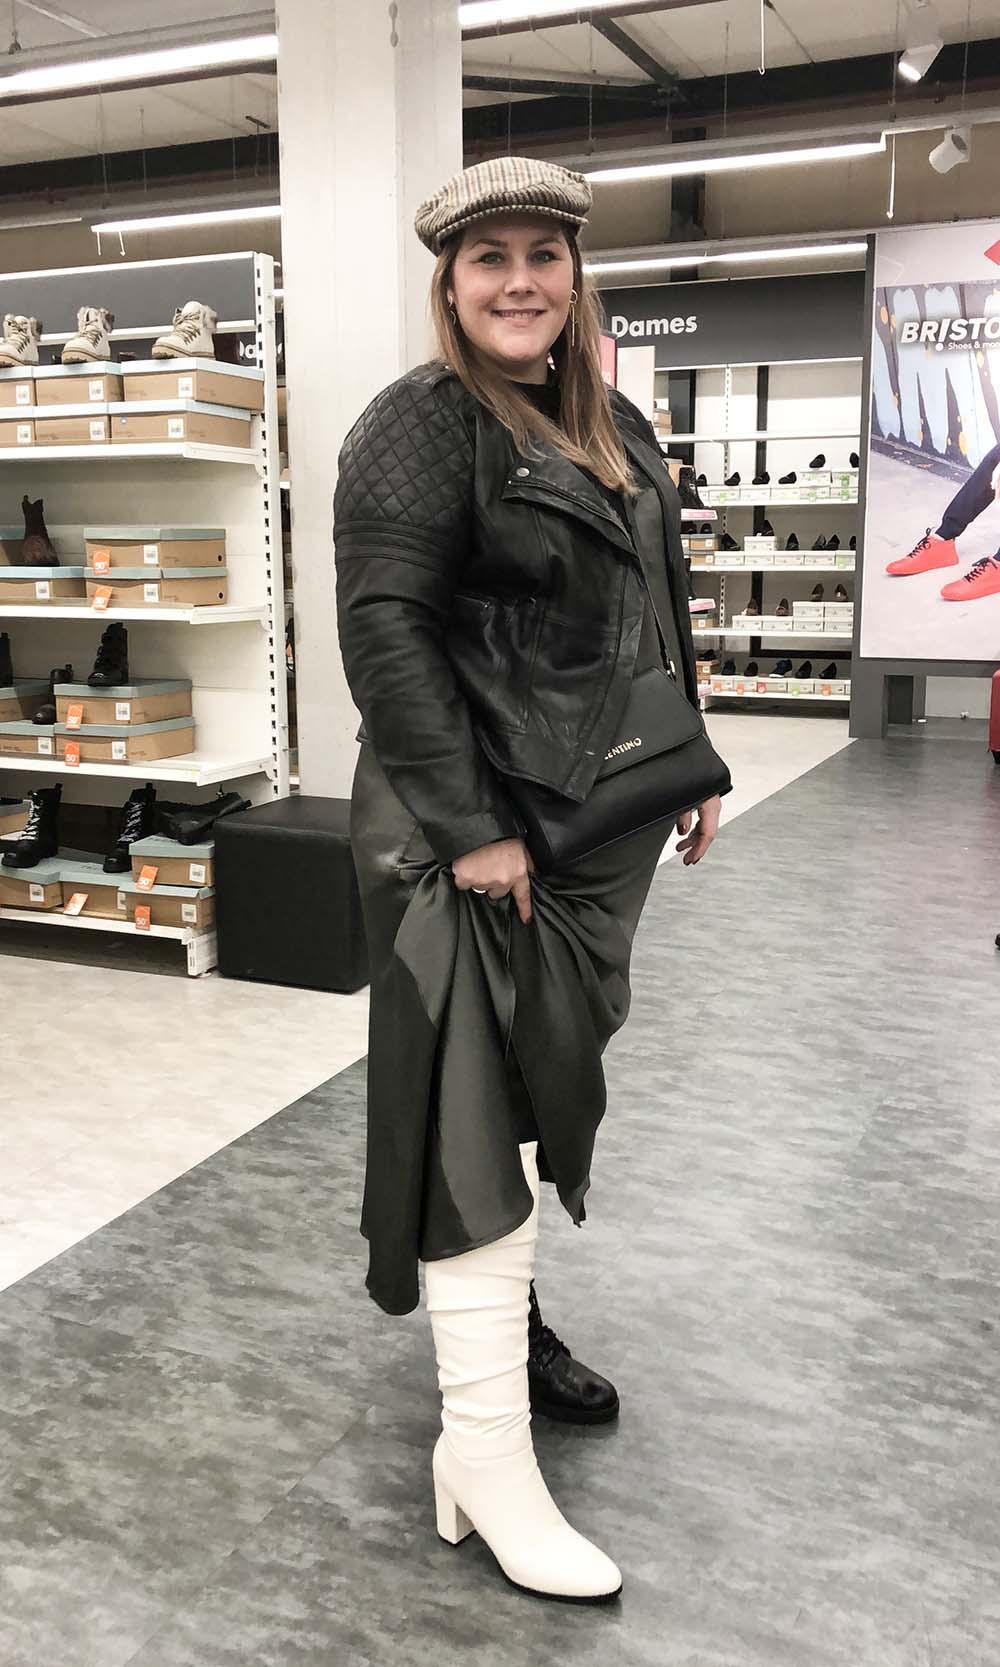 Josine Wille thebiggerblog shoplog bristol 2020